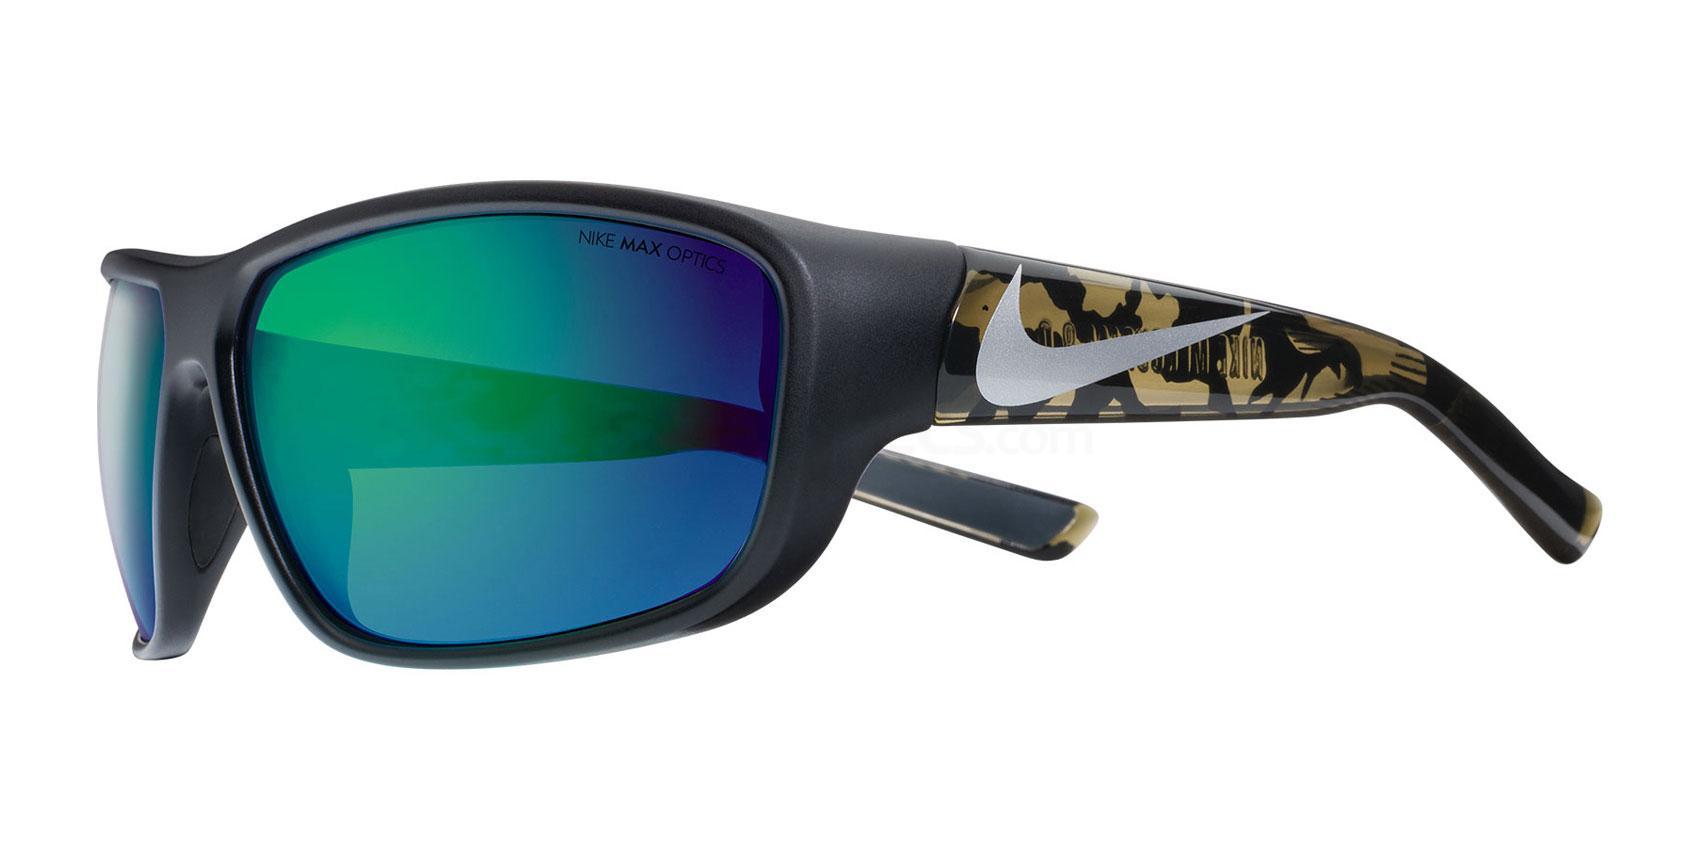 002 NIKE MERCURIAL 8.0 R EV0783 Sunglasses, Nike